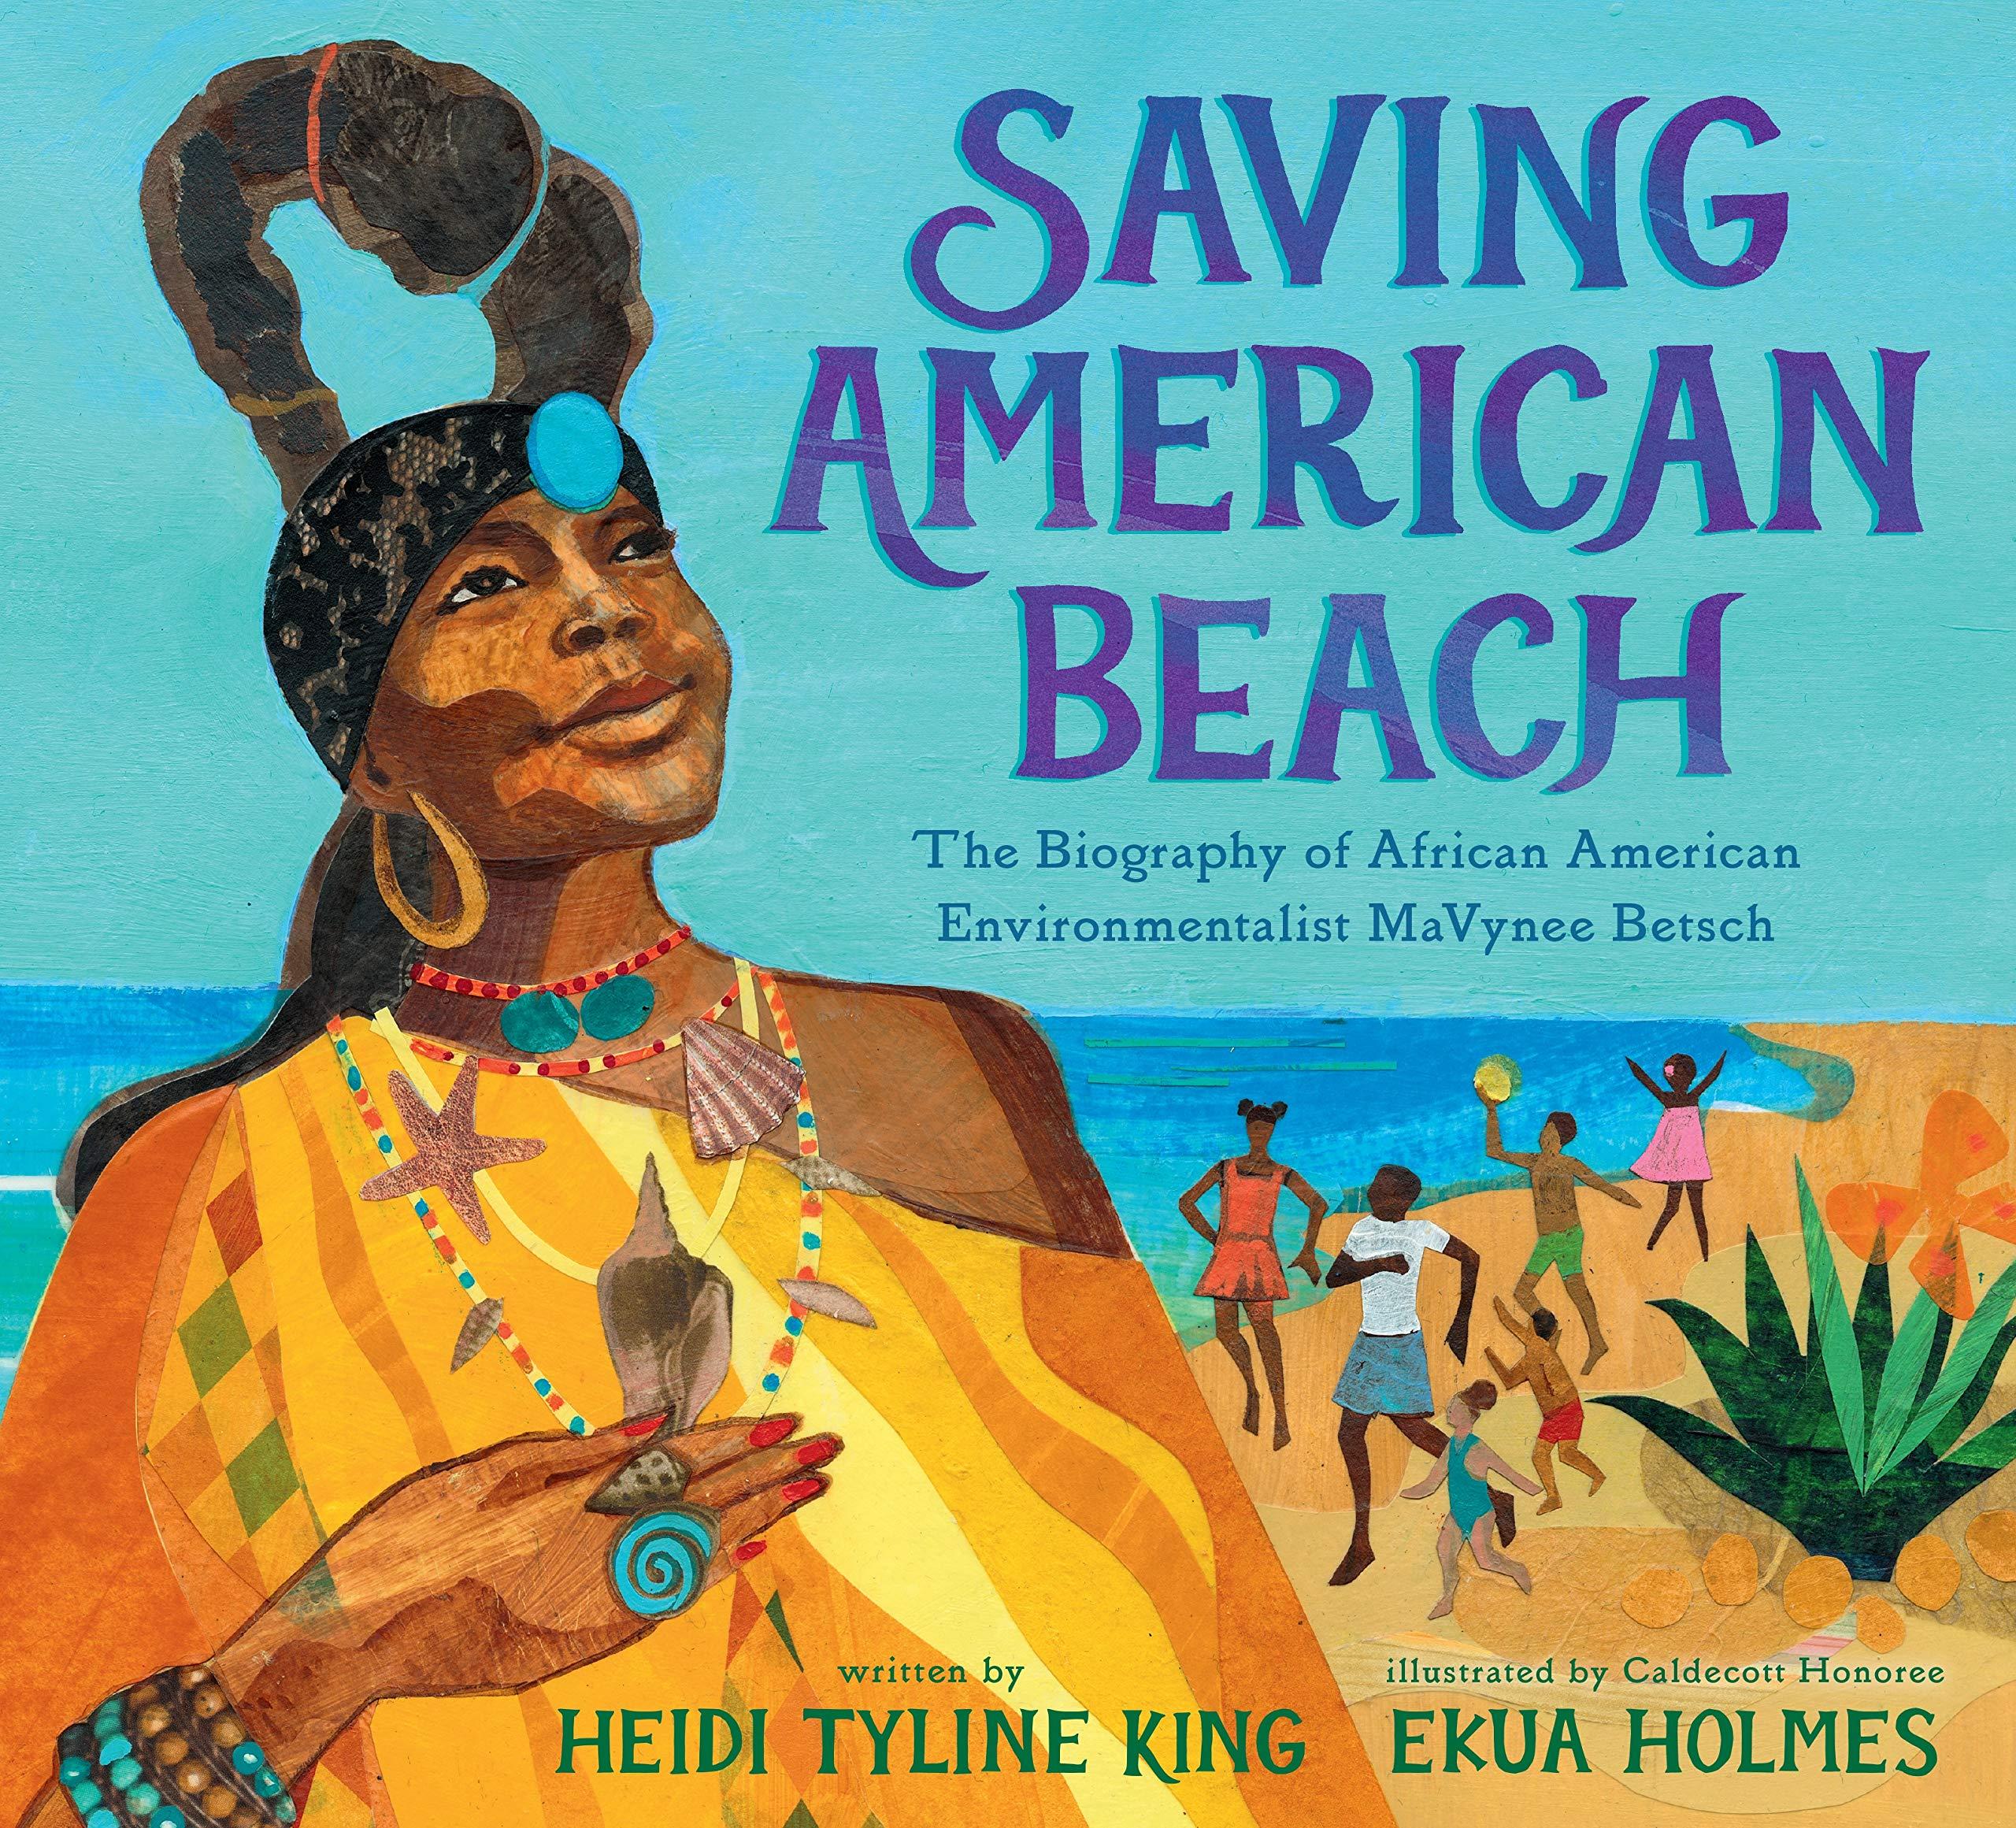 Saving American Beach: The Biography of African American Environmentalist  MaVynee Betsch: King, Heidi Tyline, Holmes, Ekua: 9781101996294:  Amazon.com: Books